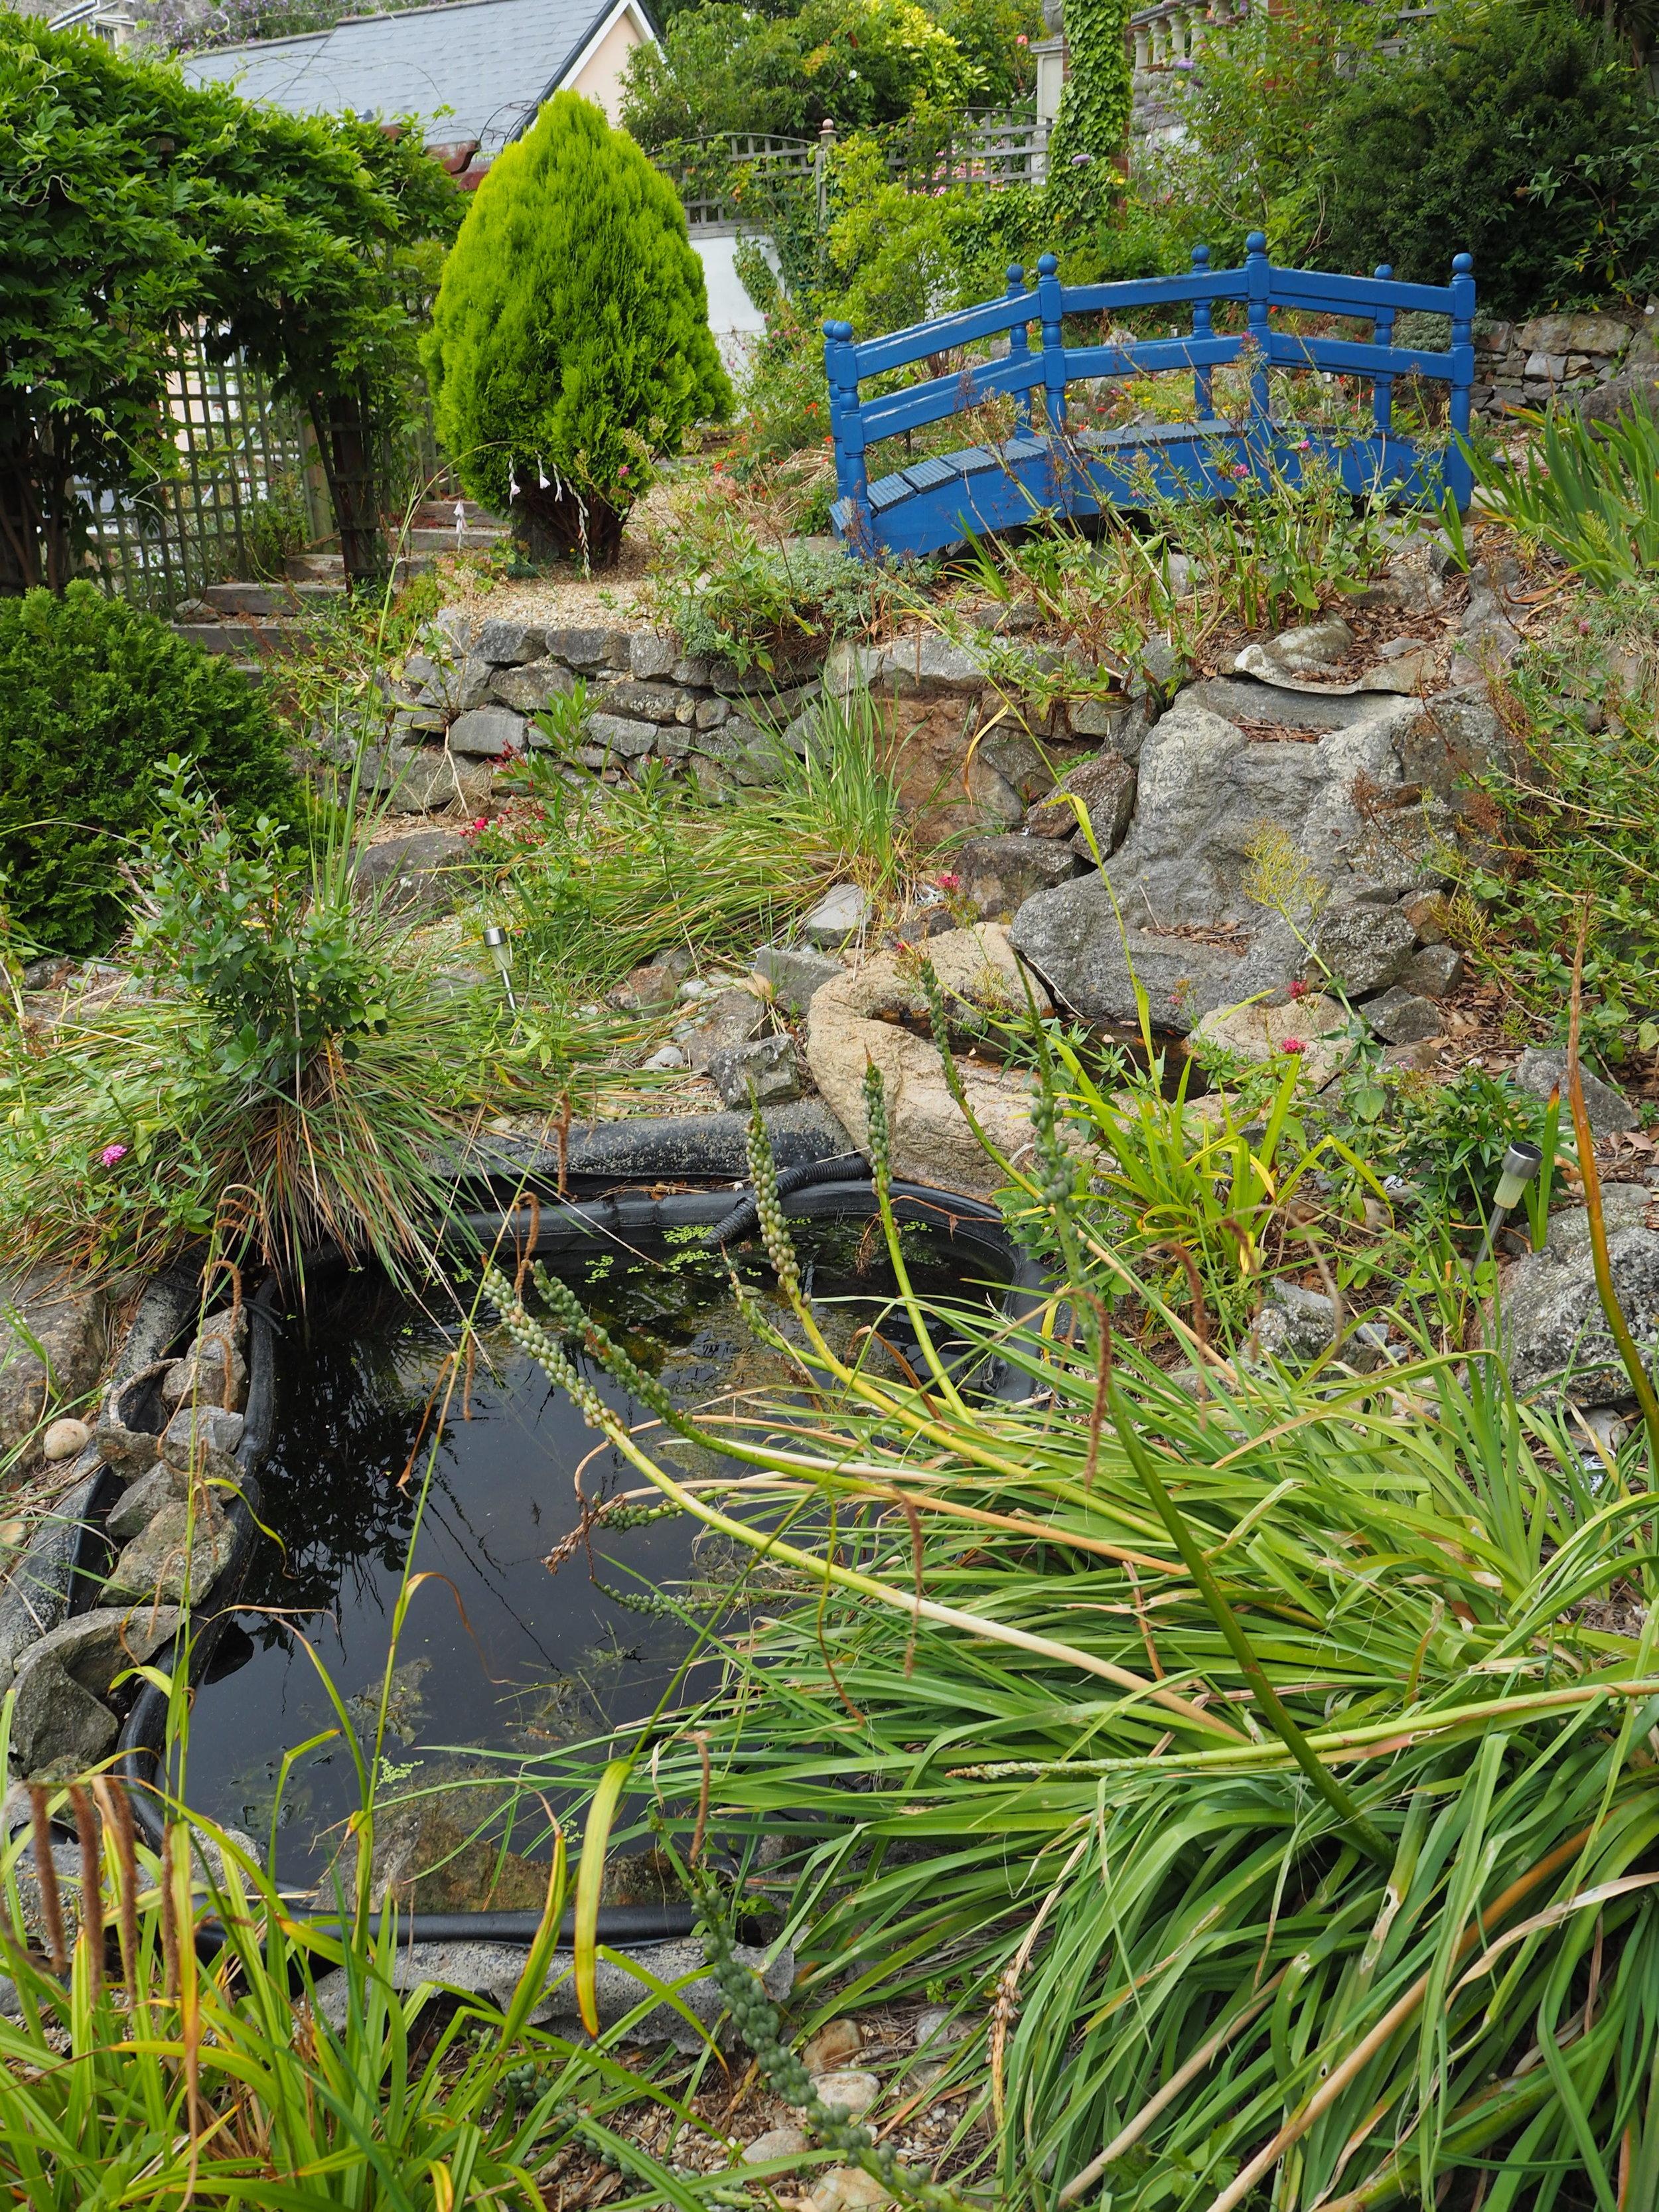 Unattractive & Lifeless Preformed Pond